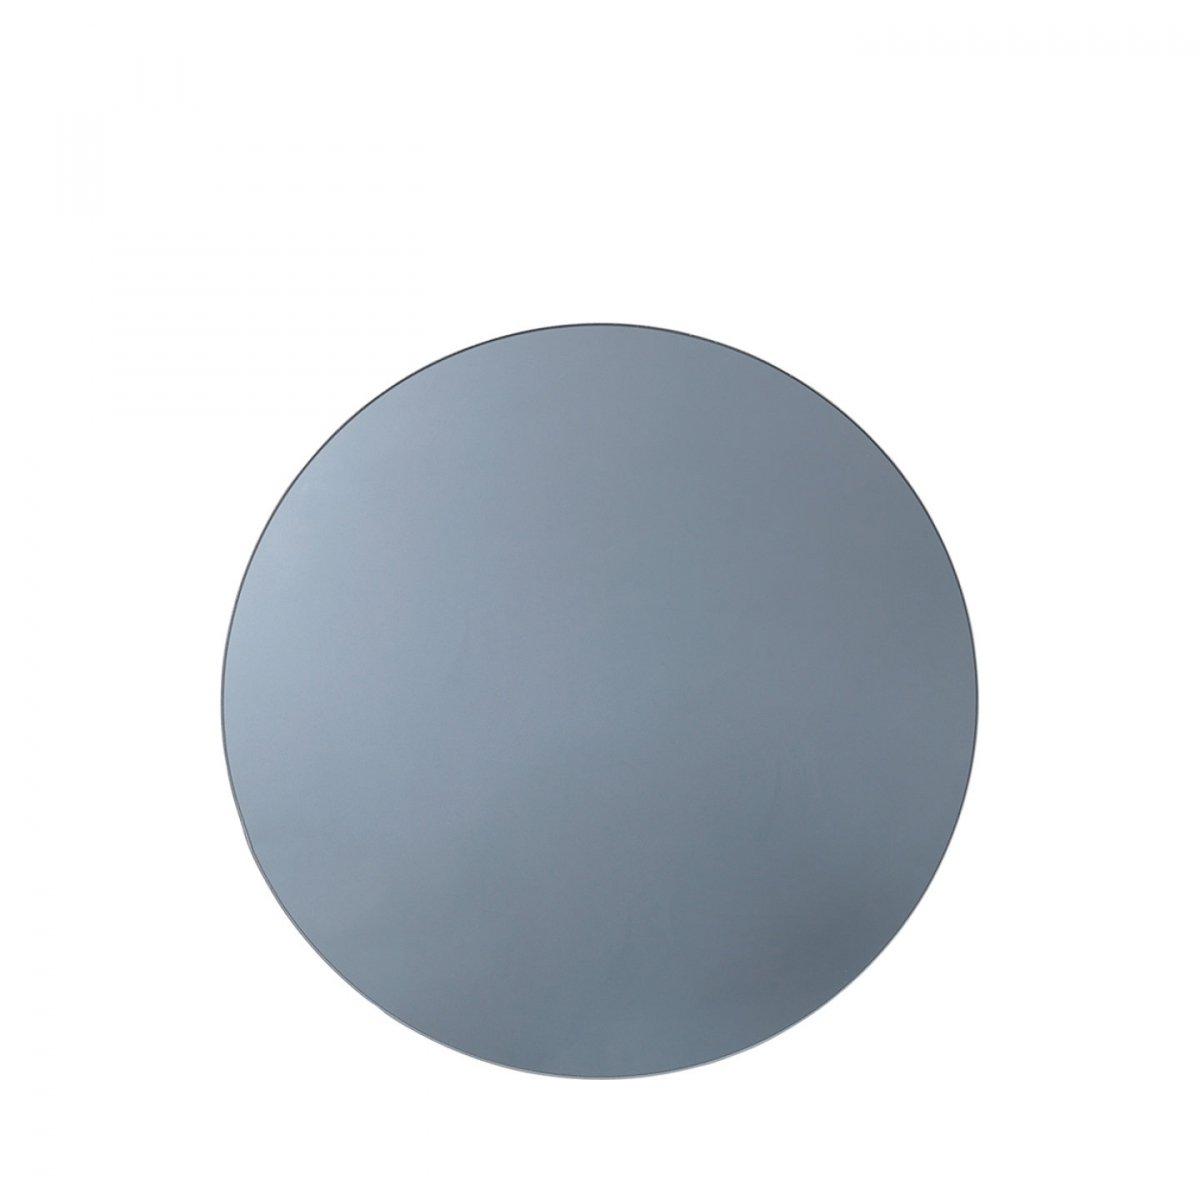 62d99b8f96ab Blomus VISION Lustro Okrągłe 30 cm Szare